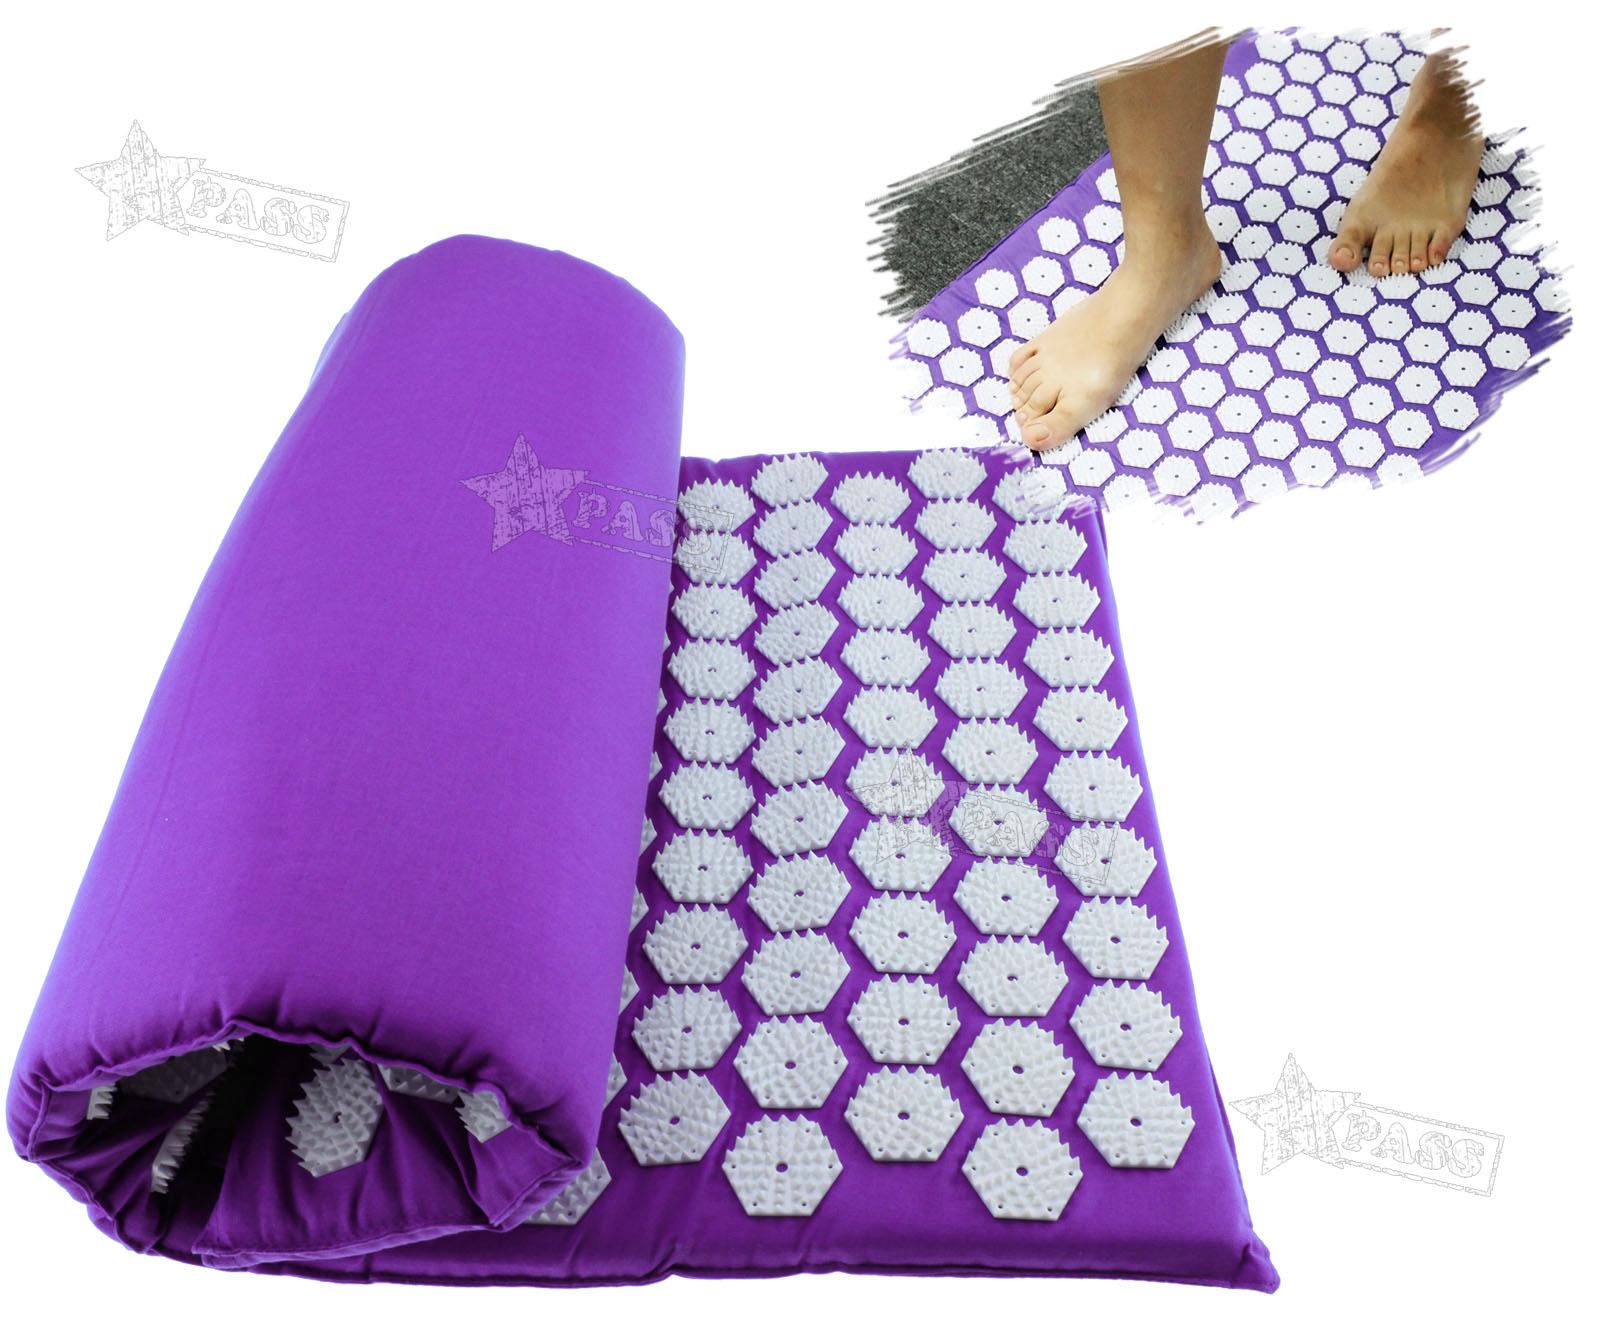 Energy Regain 75x42x2cm Nail Massage Shakti Yoga